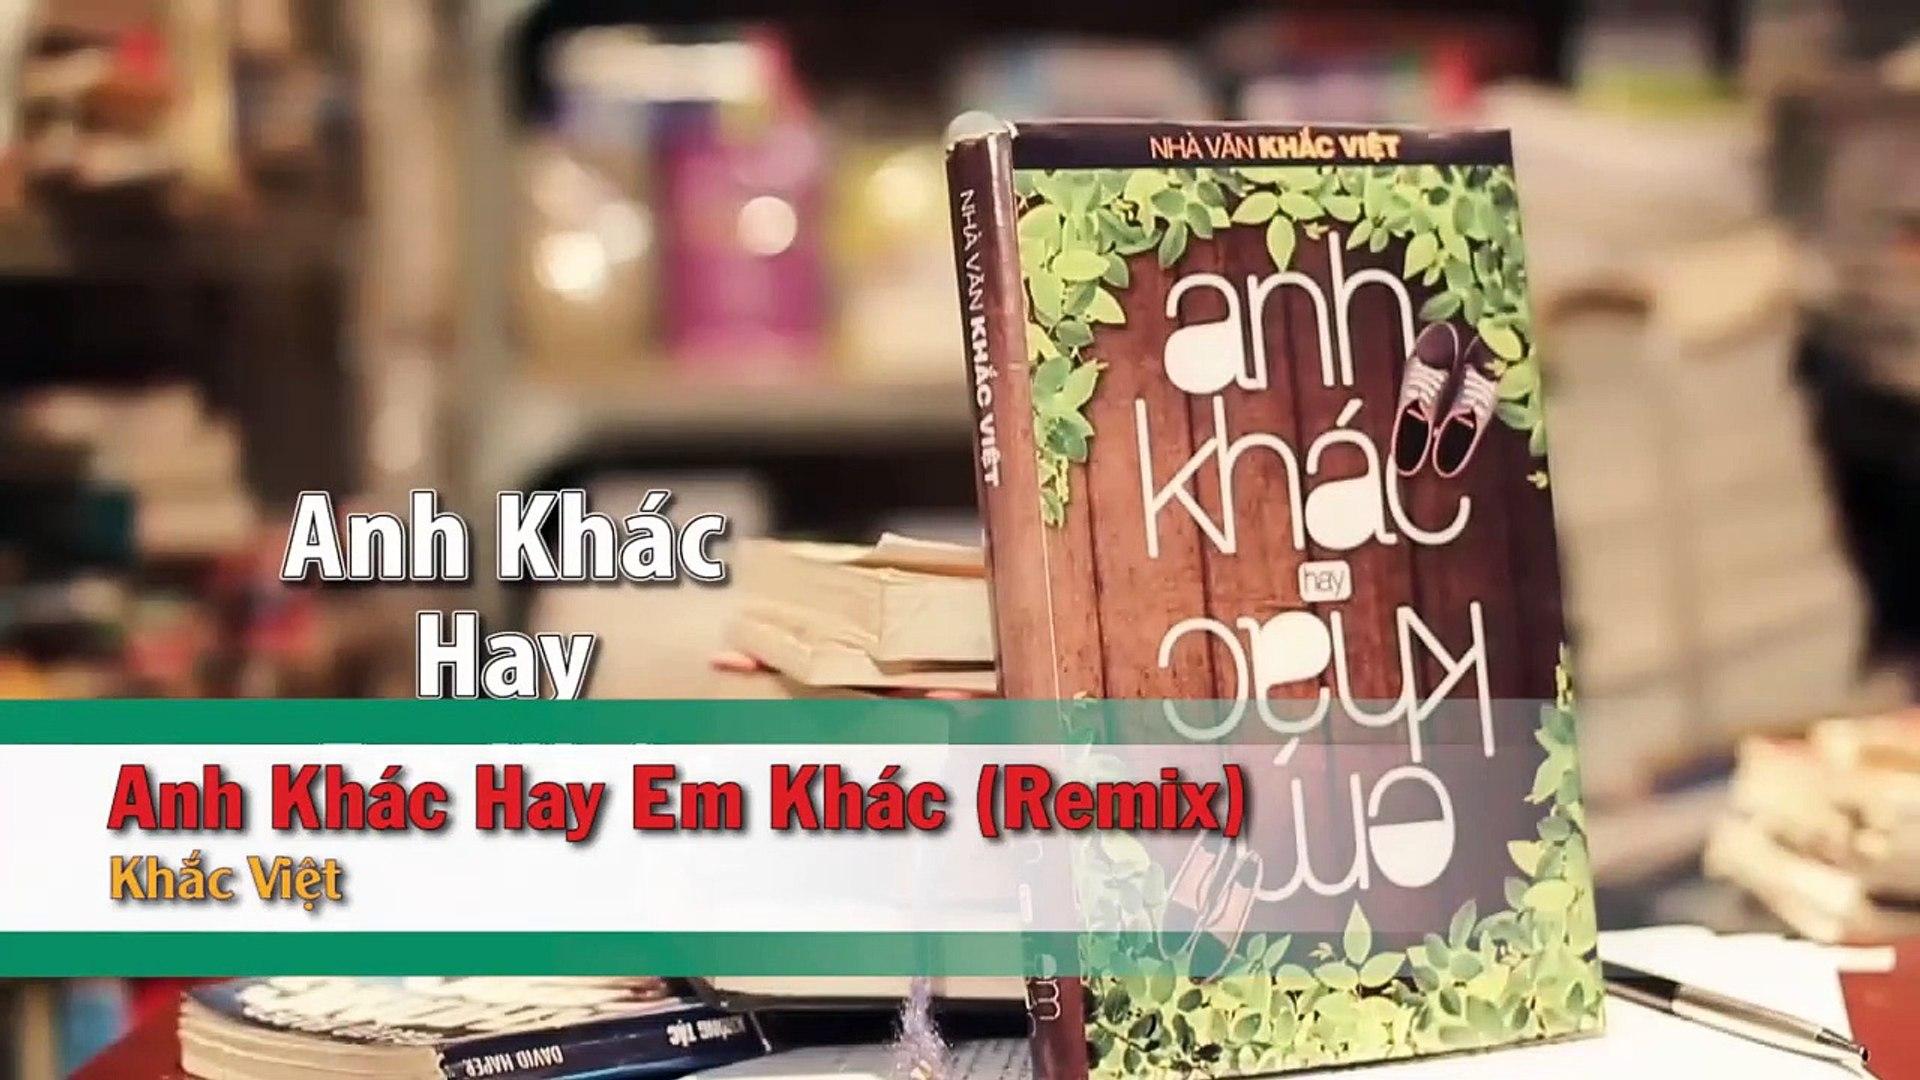 [Karaoke] Anh Khác Hay Em Khác (Remix) - Khắc Việt [Beat]